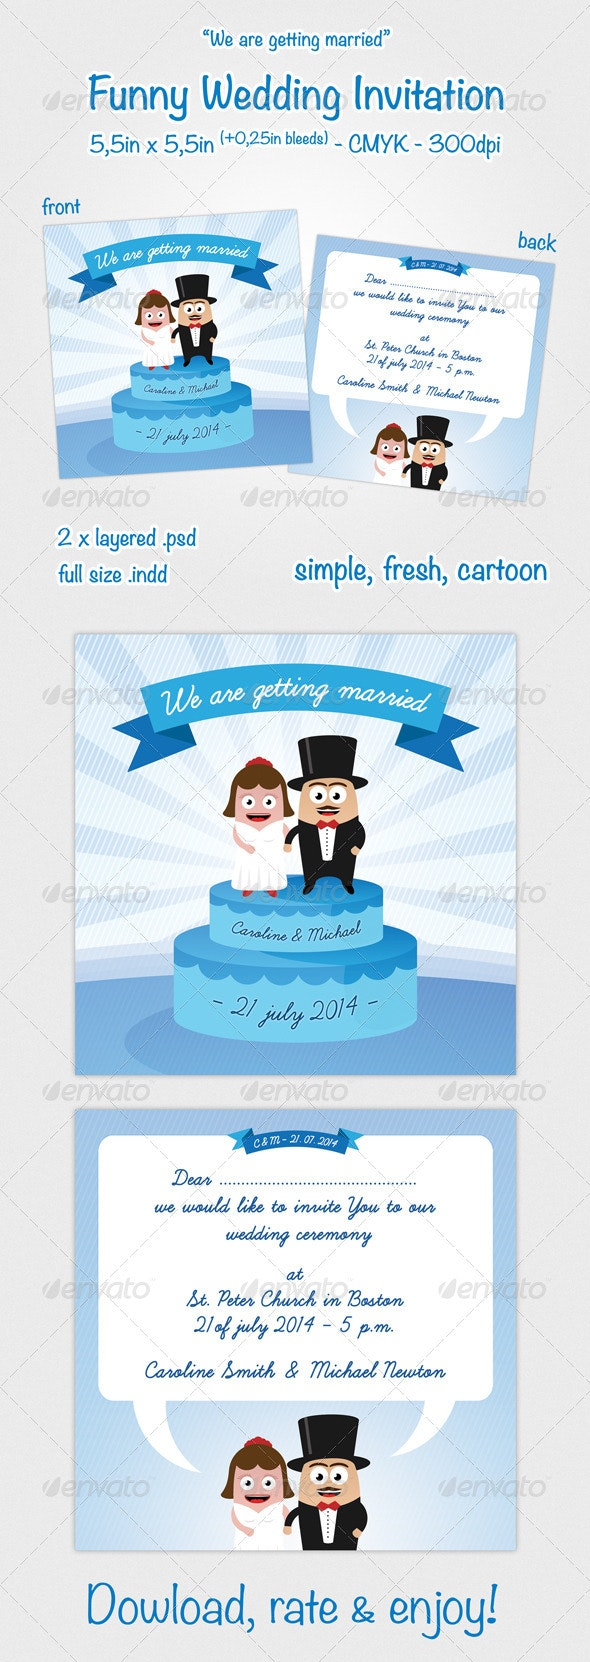 Funny Wedding Invitation - Weddings Cards & Invites